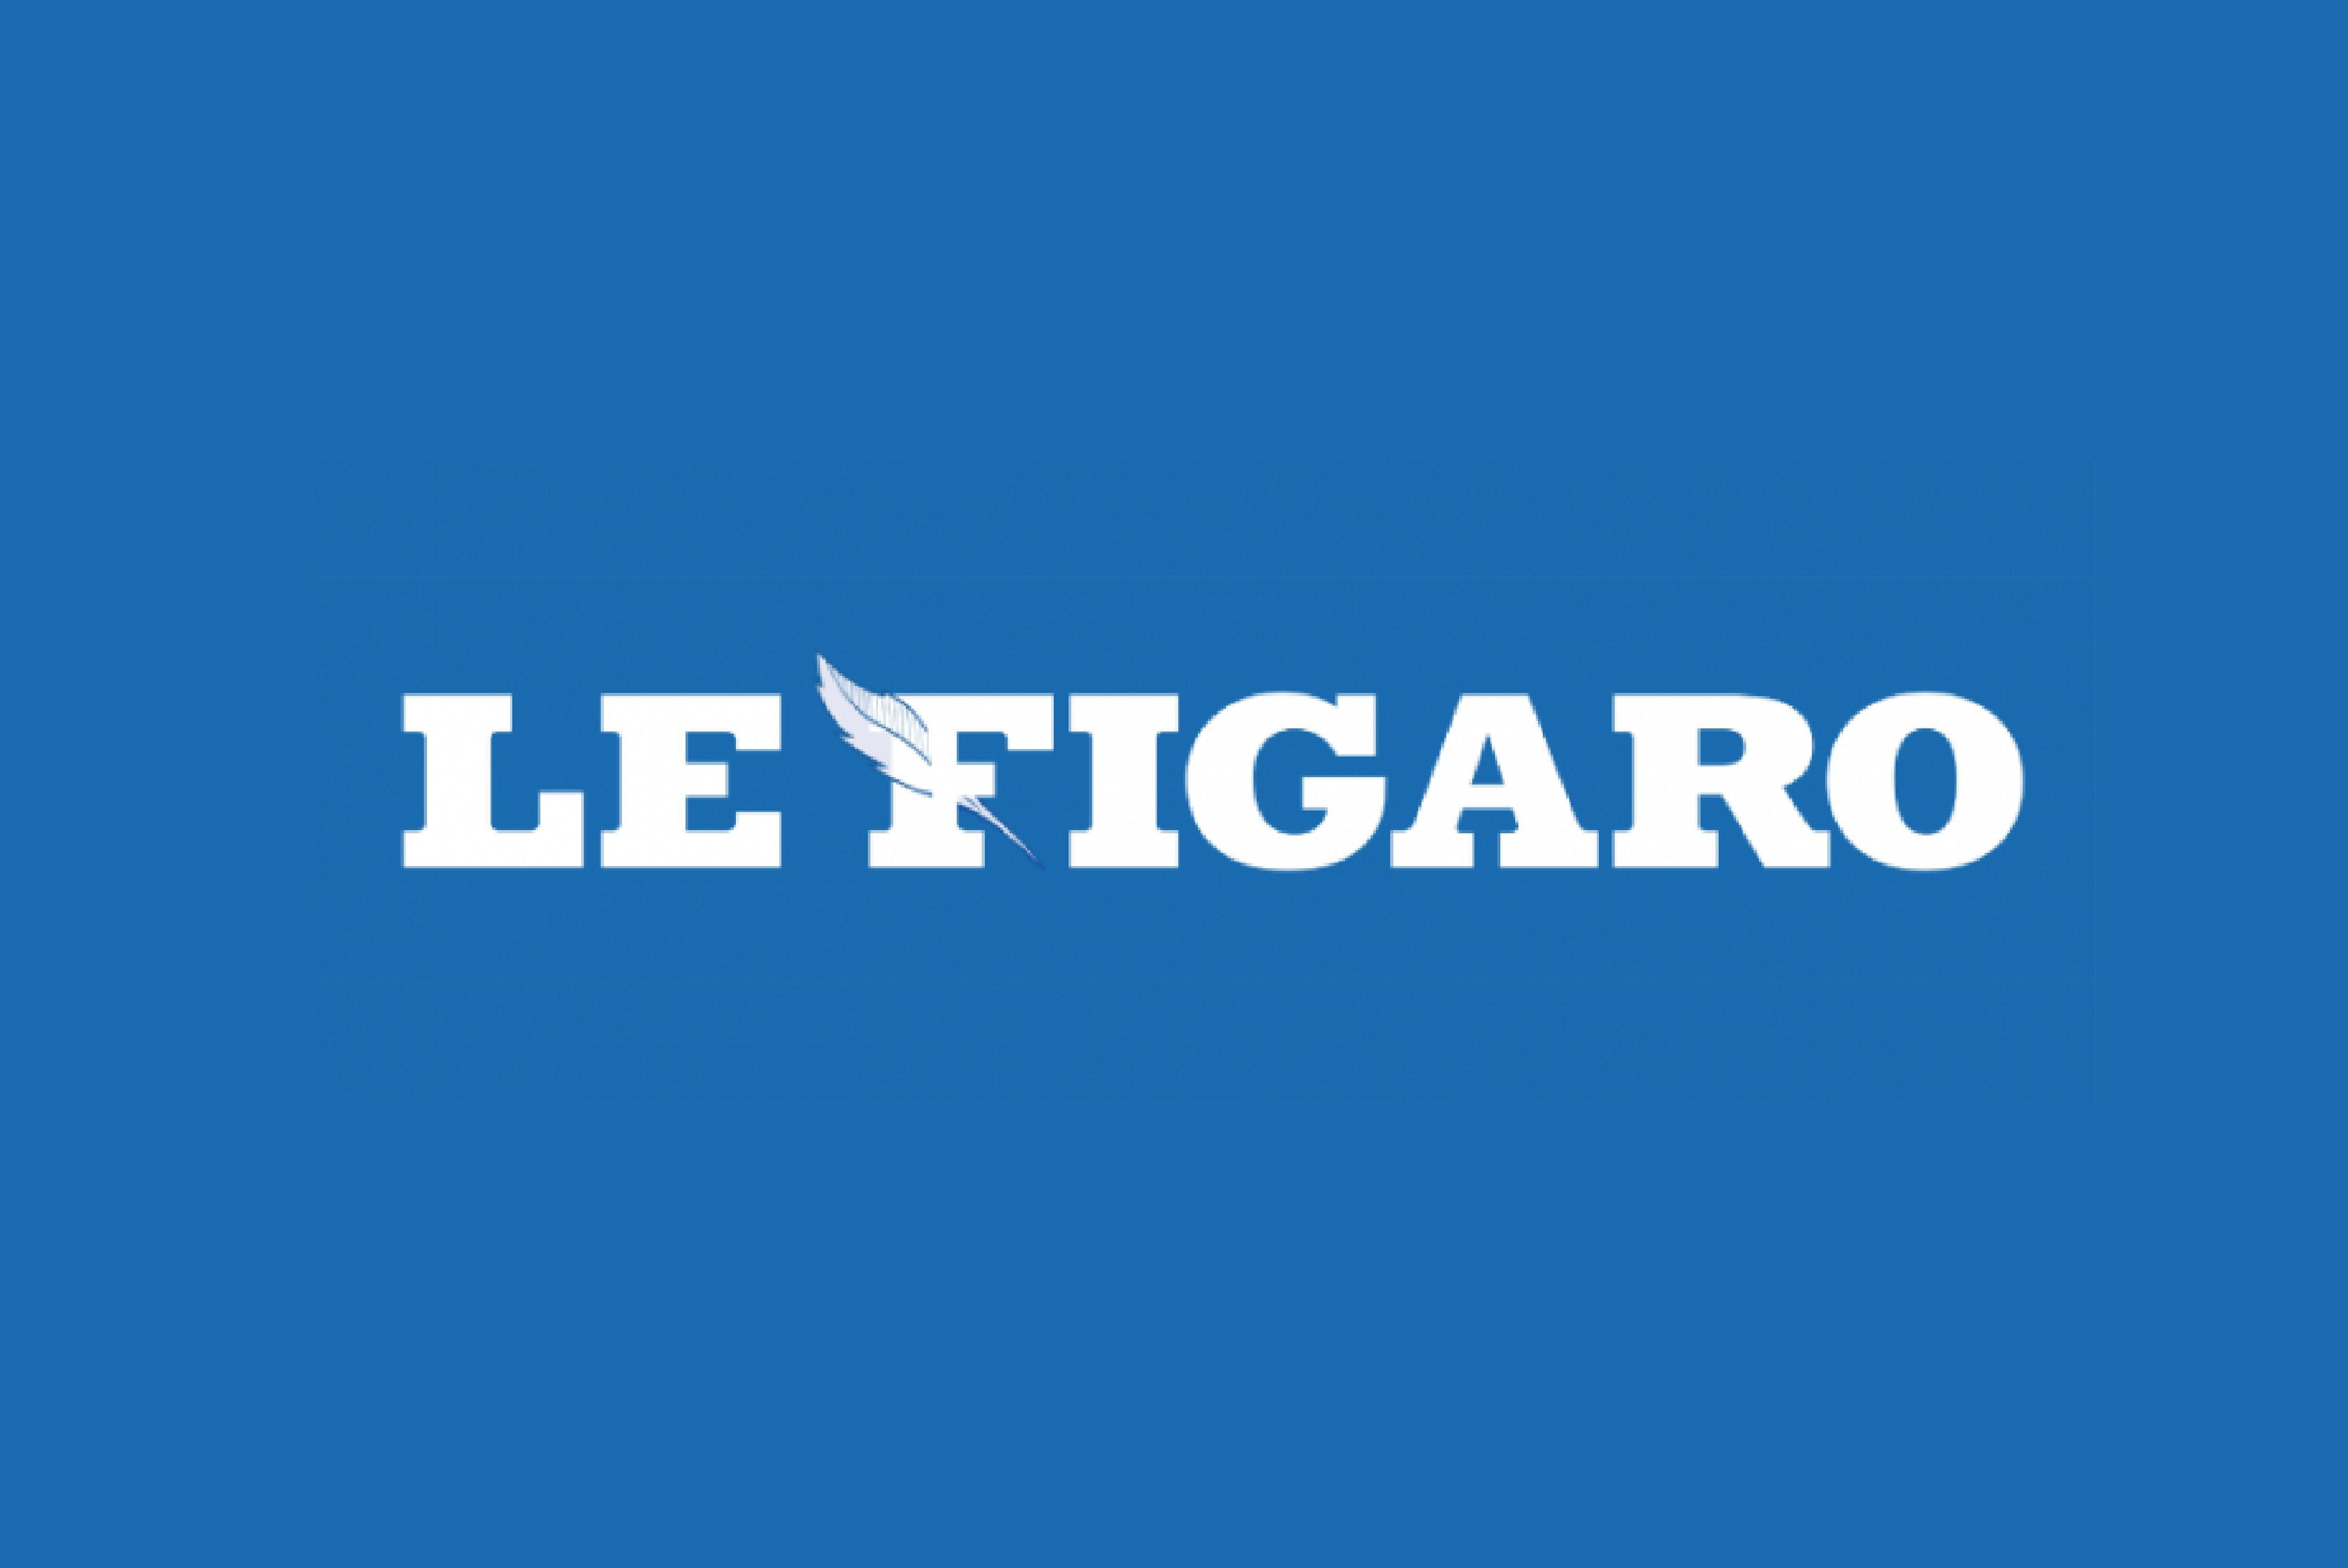 Logotipo del francés Le Figaro